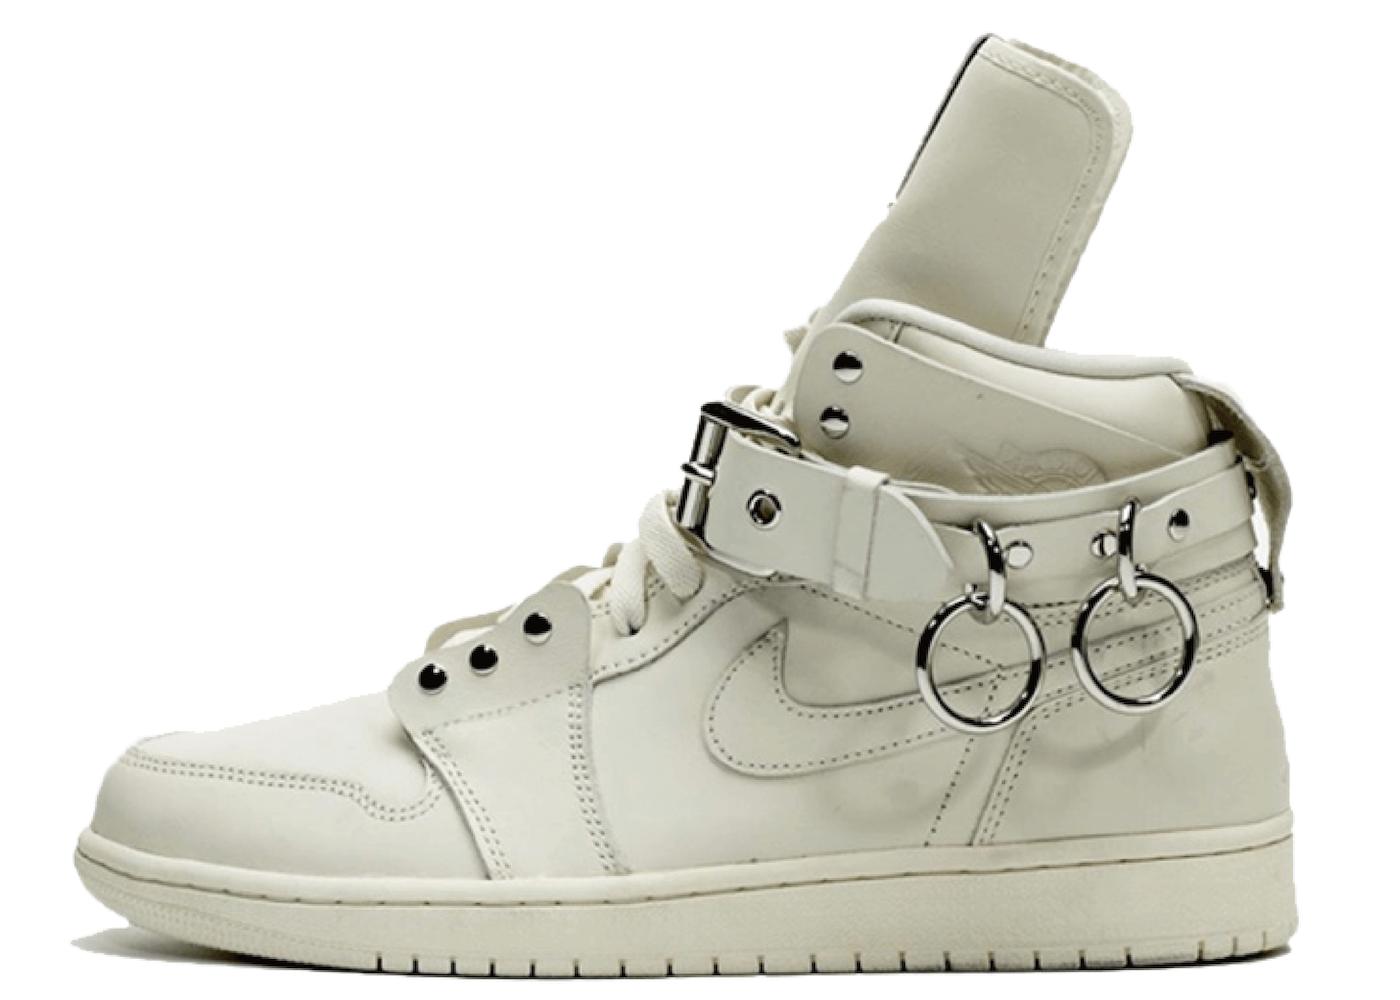 Comme des Garcons × Nike Air Jordan 1 Retro High Whiteの写真